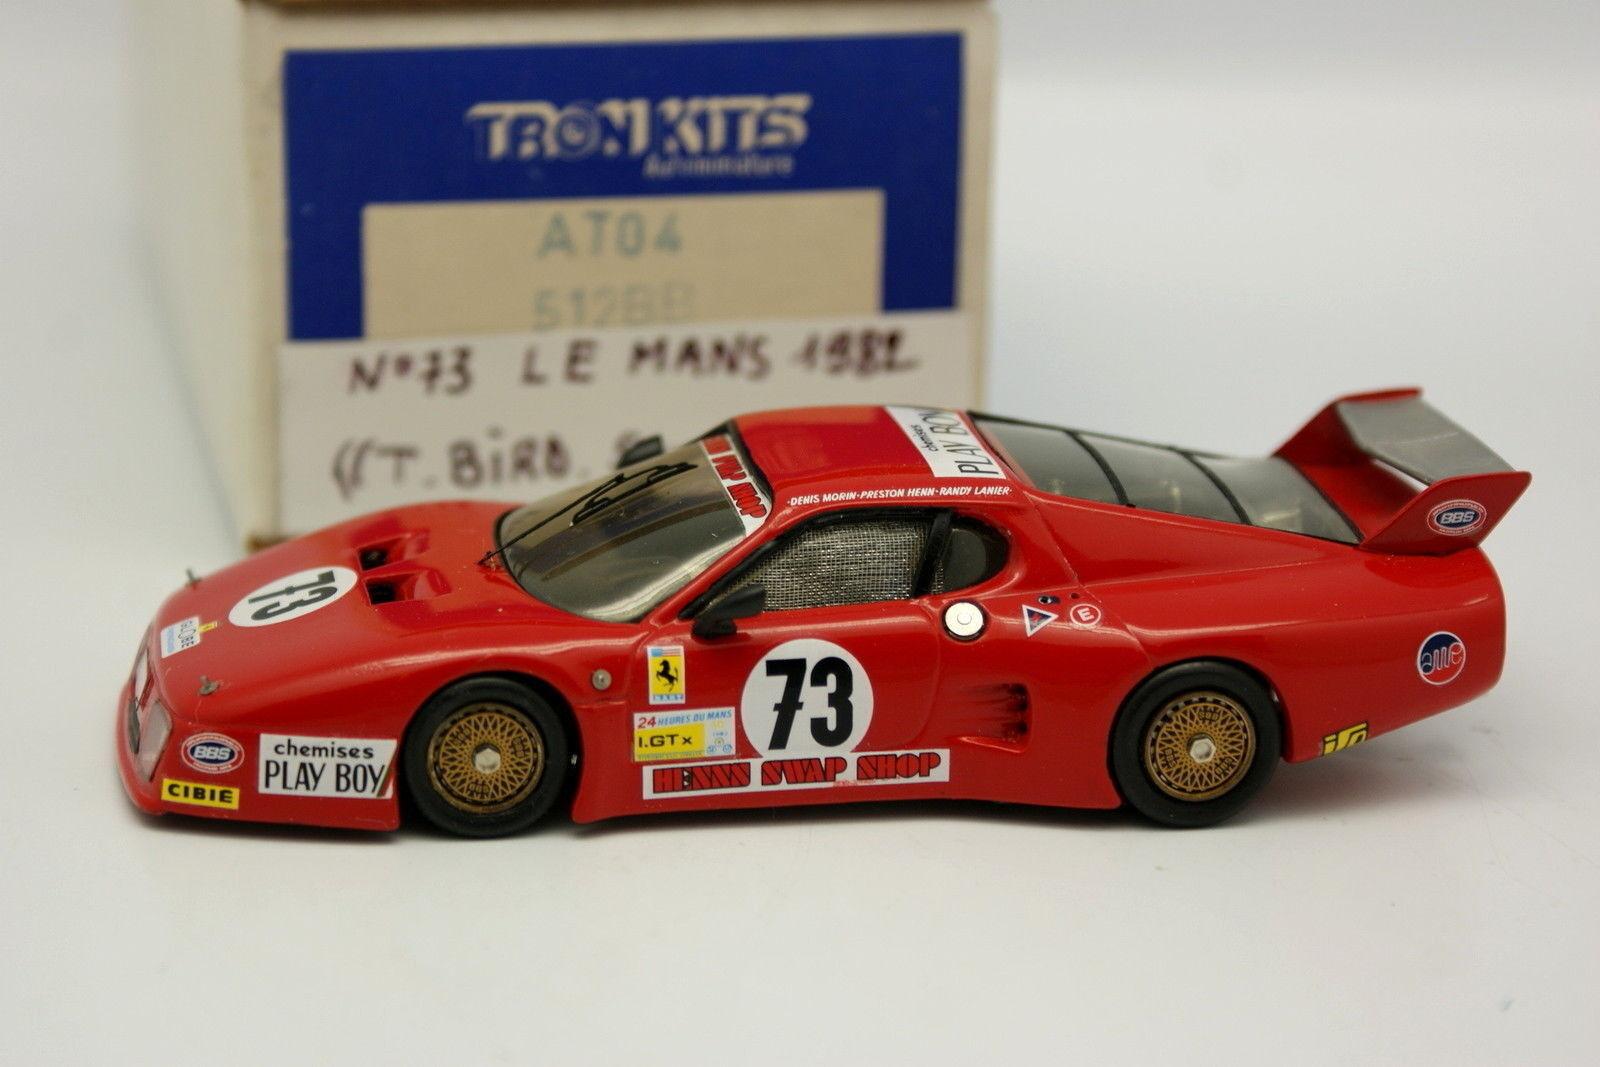 AMR Kit Montado 1 43 - Ferrari 512Bb Tbird Swap Shop Le Mans 1982 N º 73